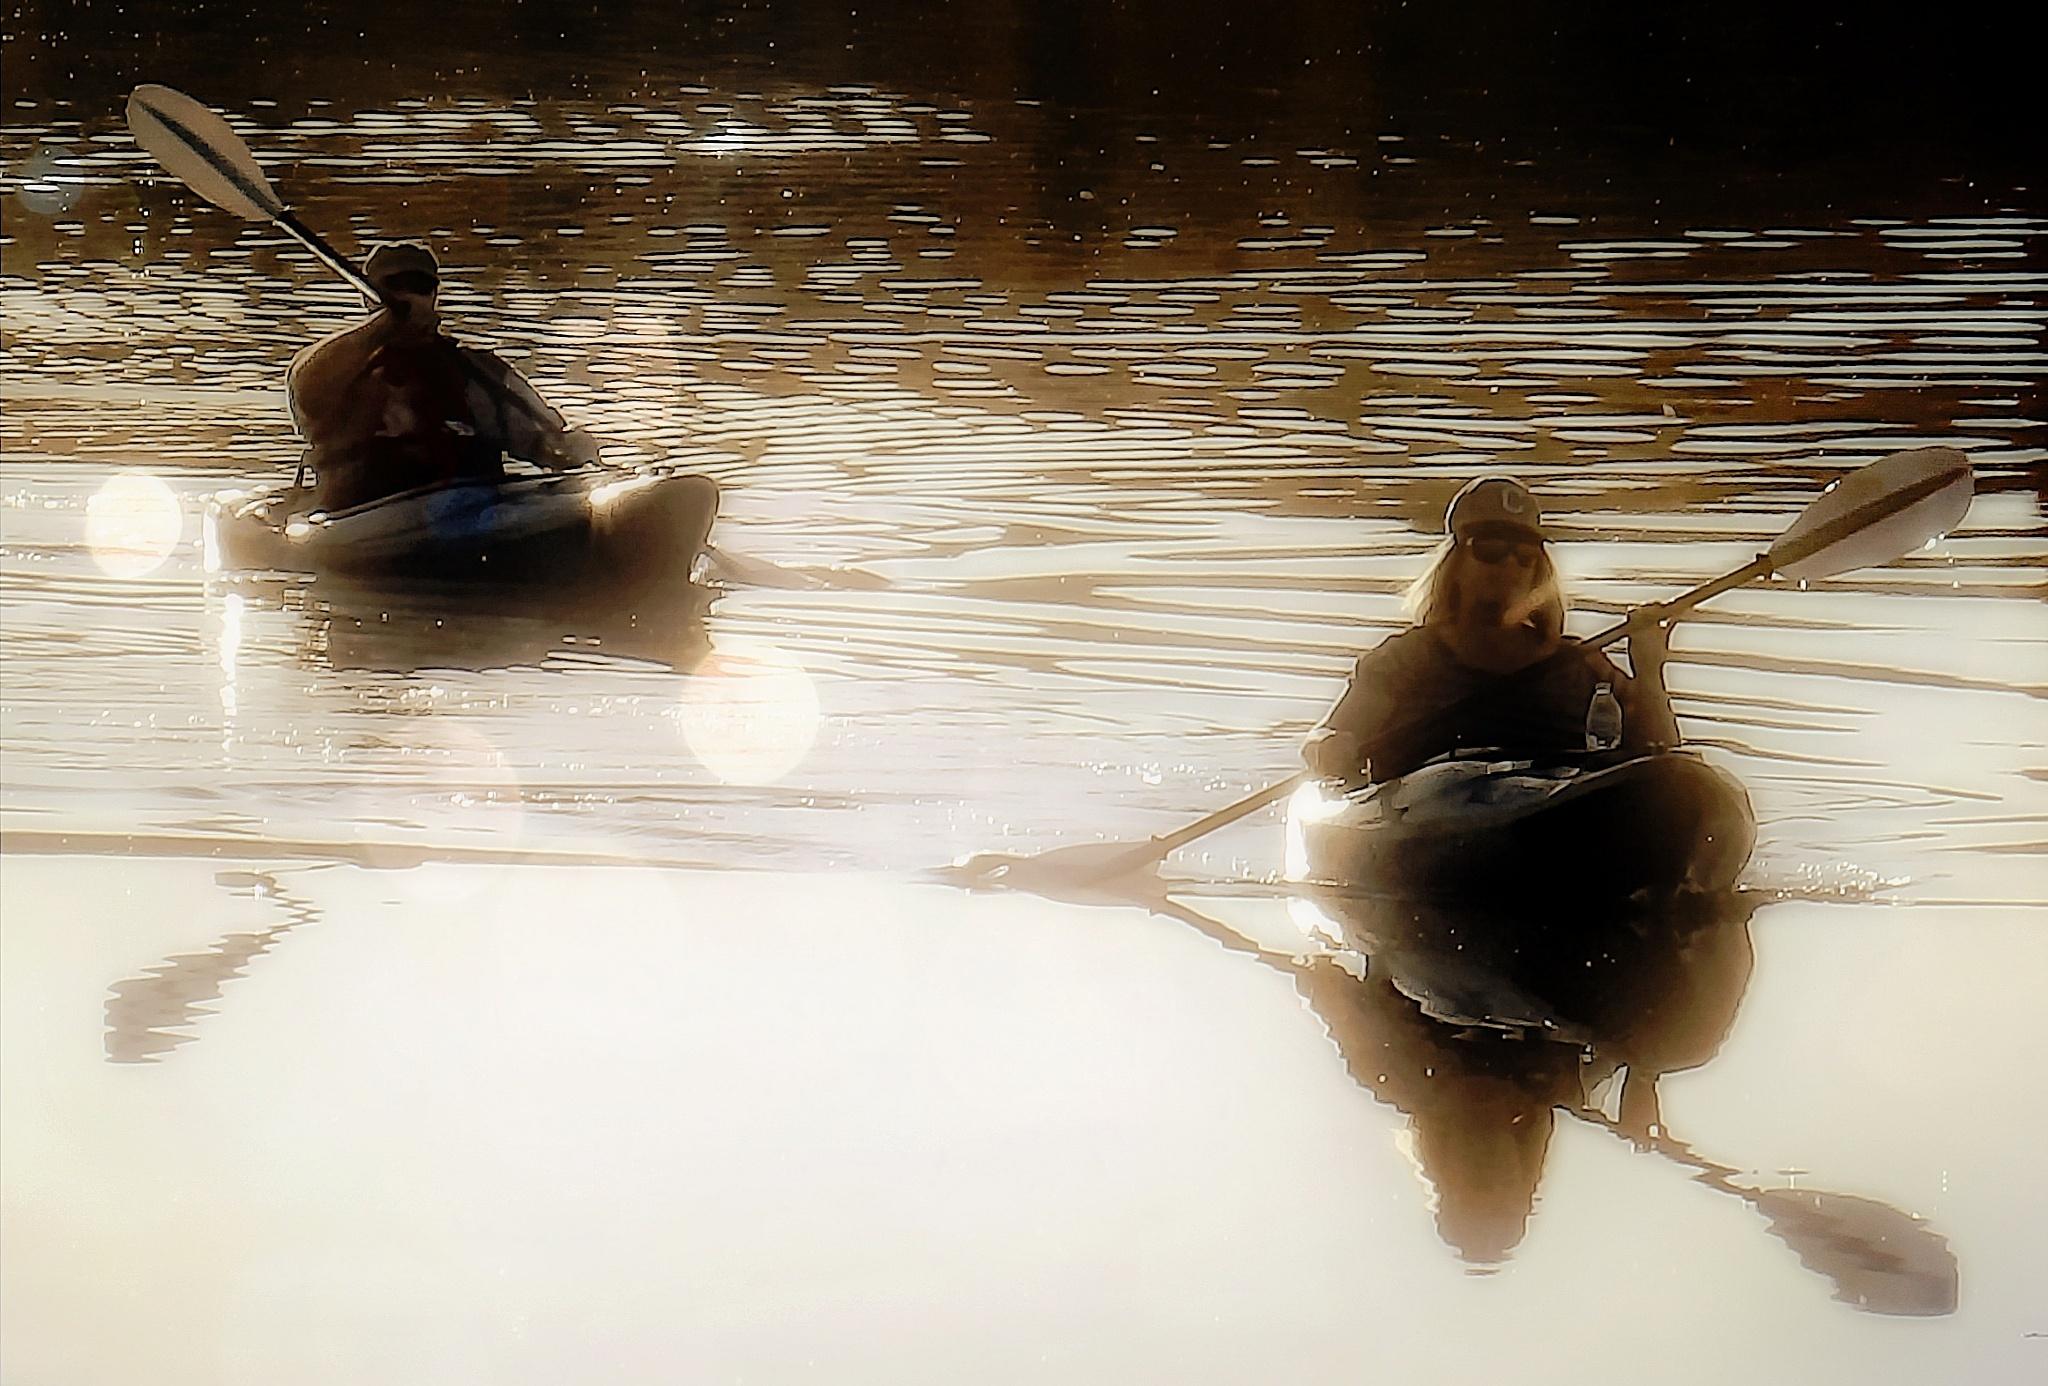 Kayaking by Darlene Eastin